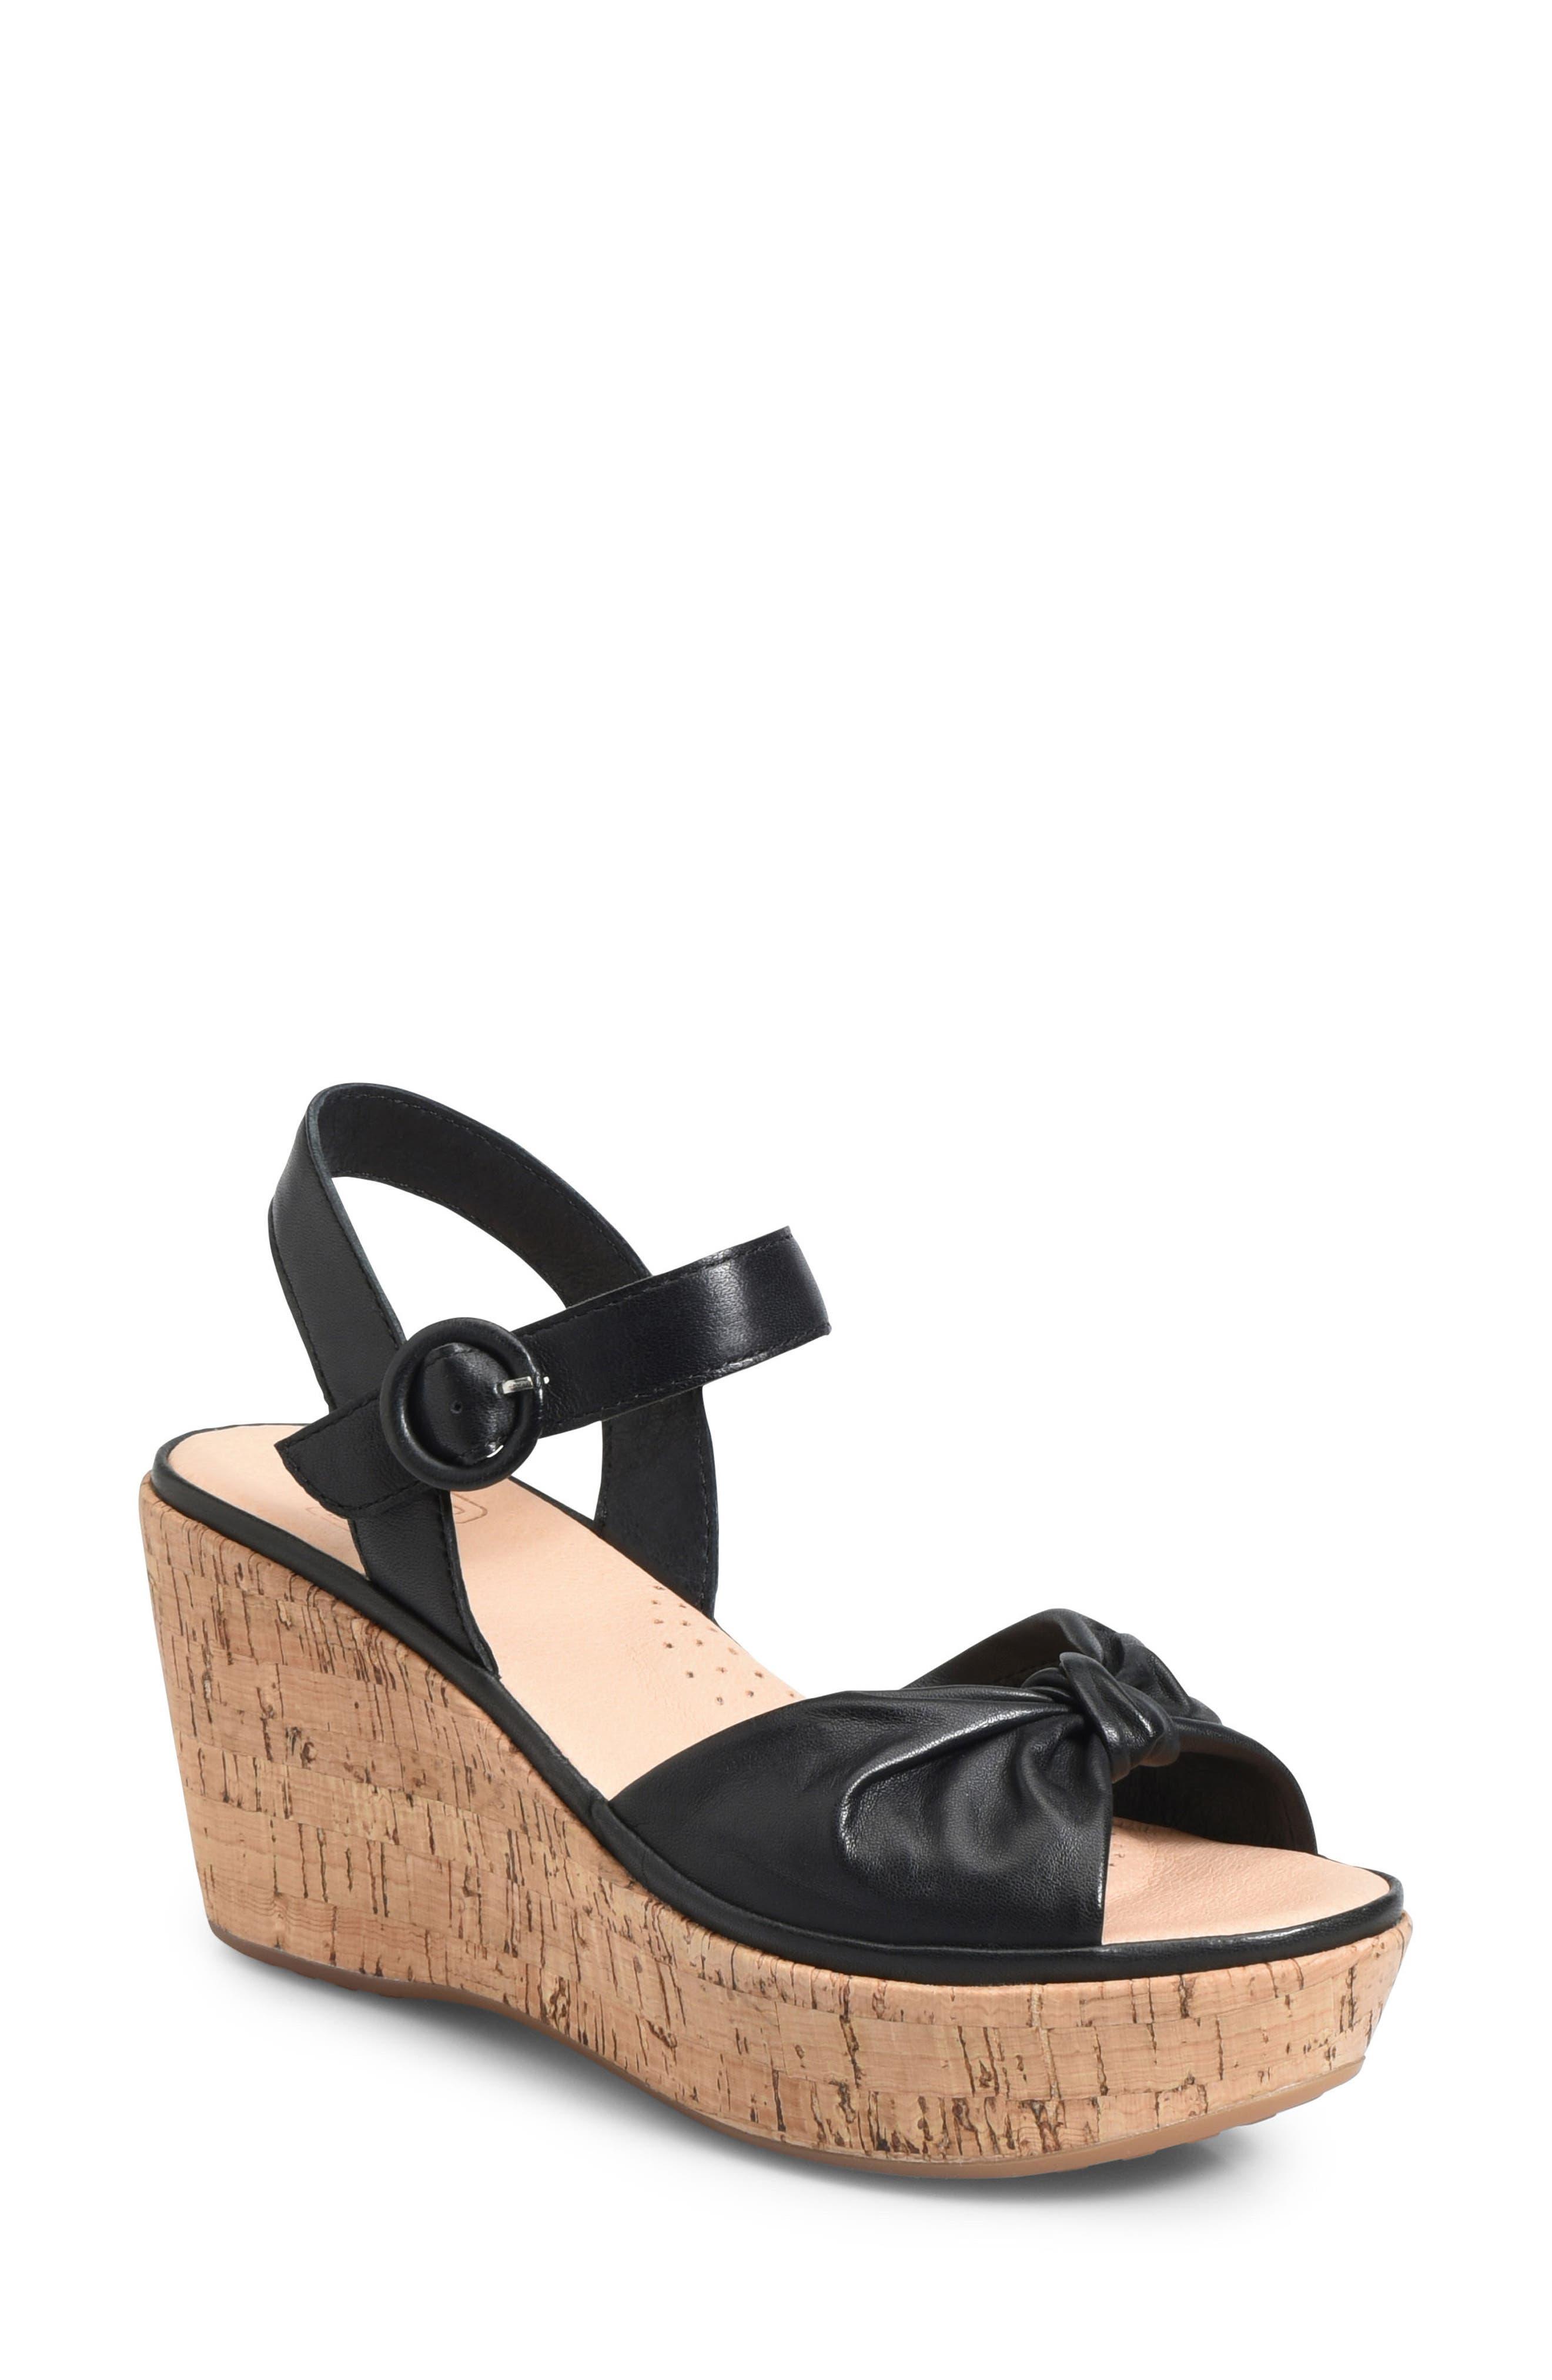 ONO Heavenly Platform Wedge Sandal, Main, color, BLACK LEATHER